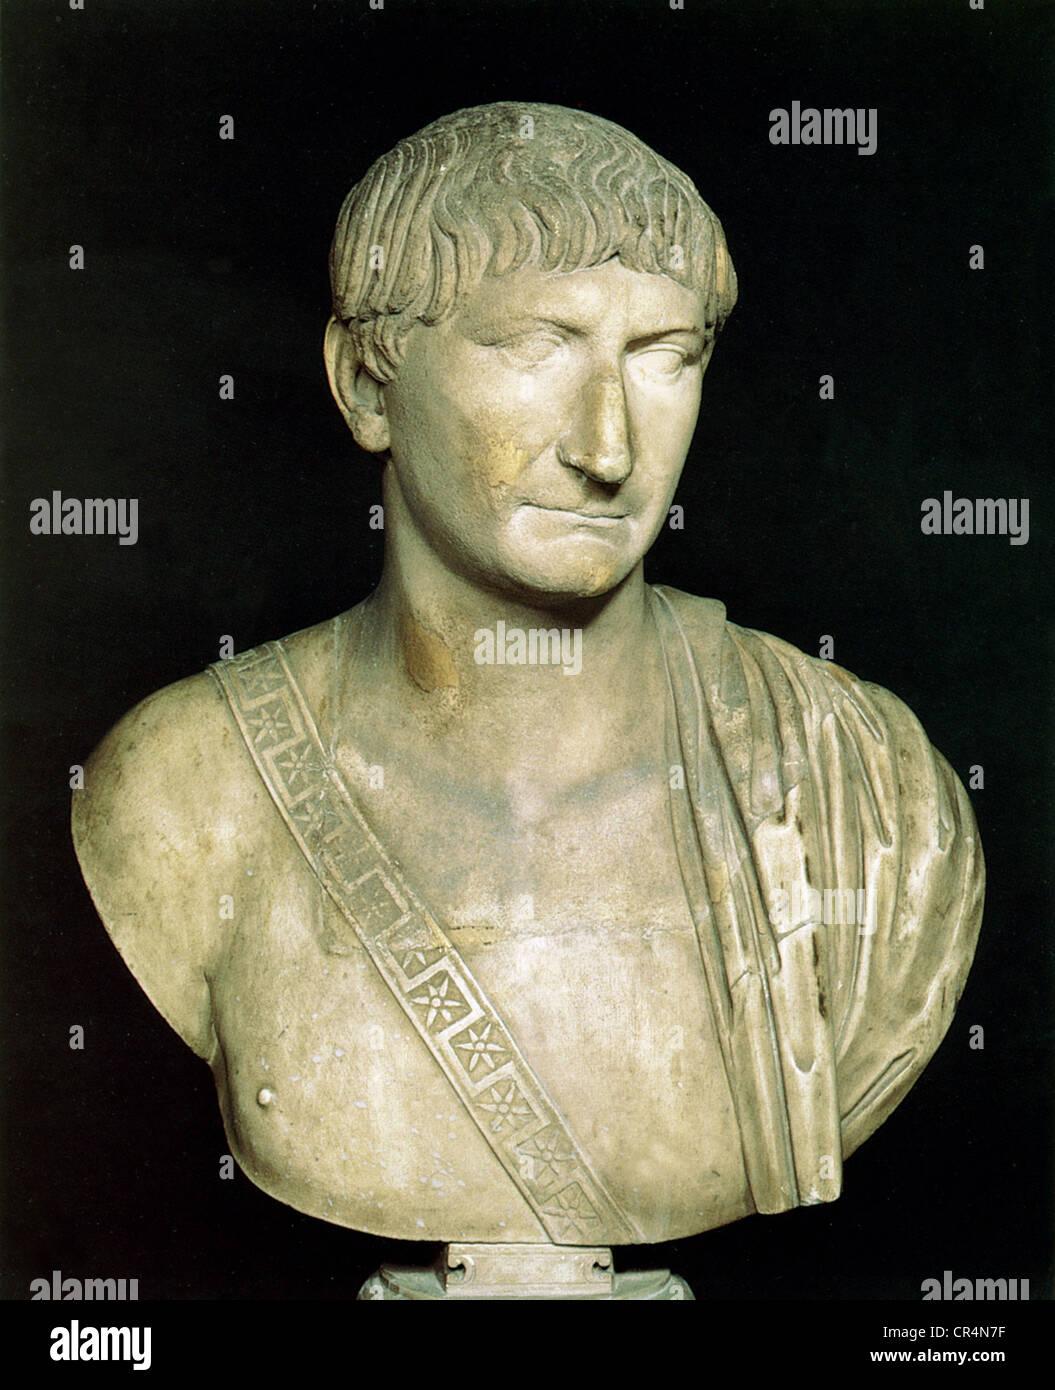 Trajan (Marcus Ulpius Traianus), 18.9.53 - 8.8.117, römischer Kaiser 27.1.98 - 8,8117, Porträt, Büste, Stockbild